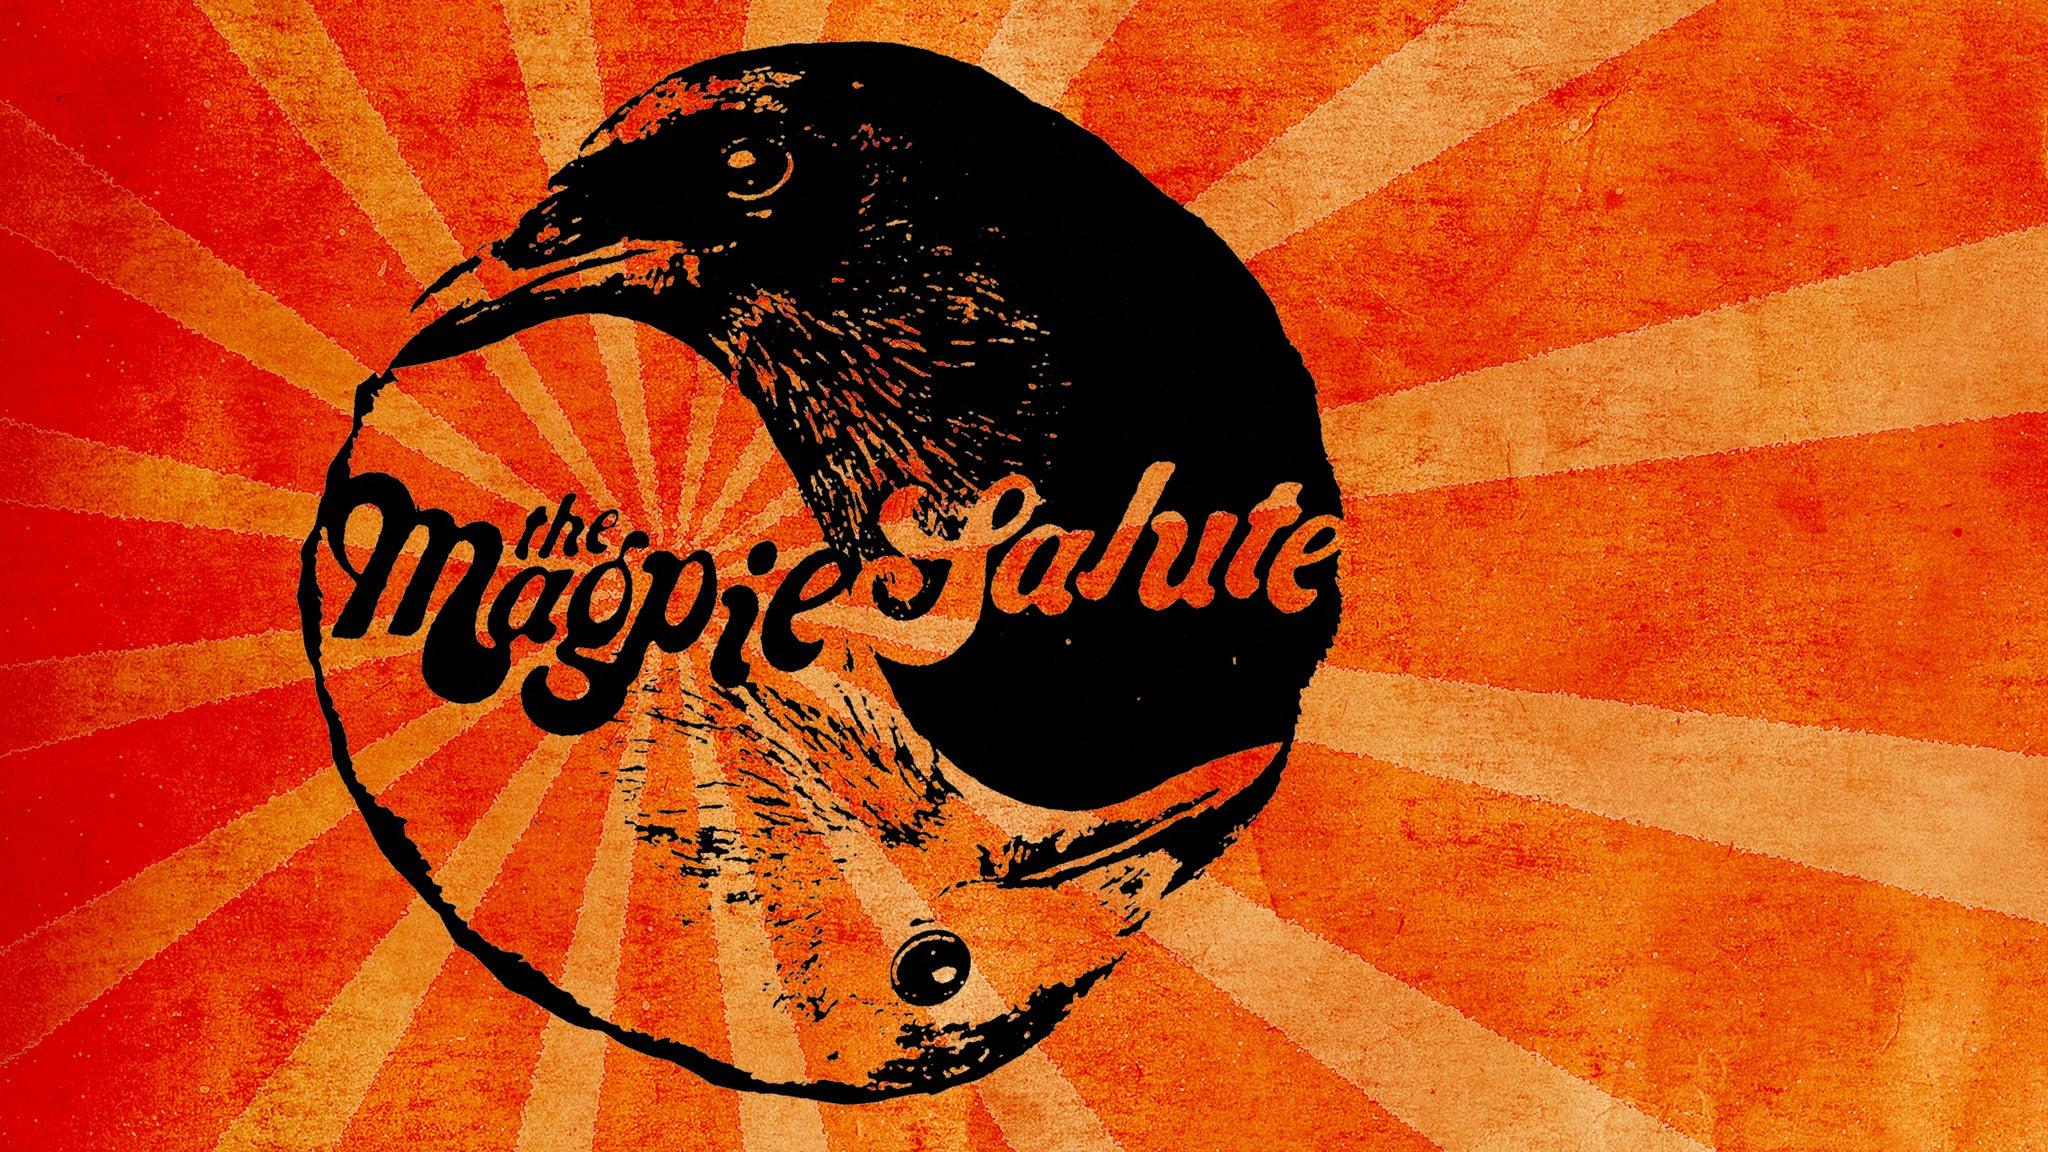 The Magpie Salute at Buckhead Theatre